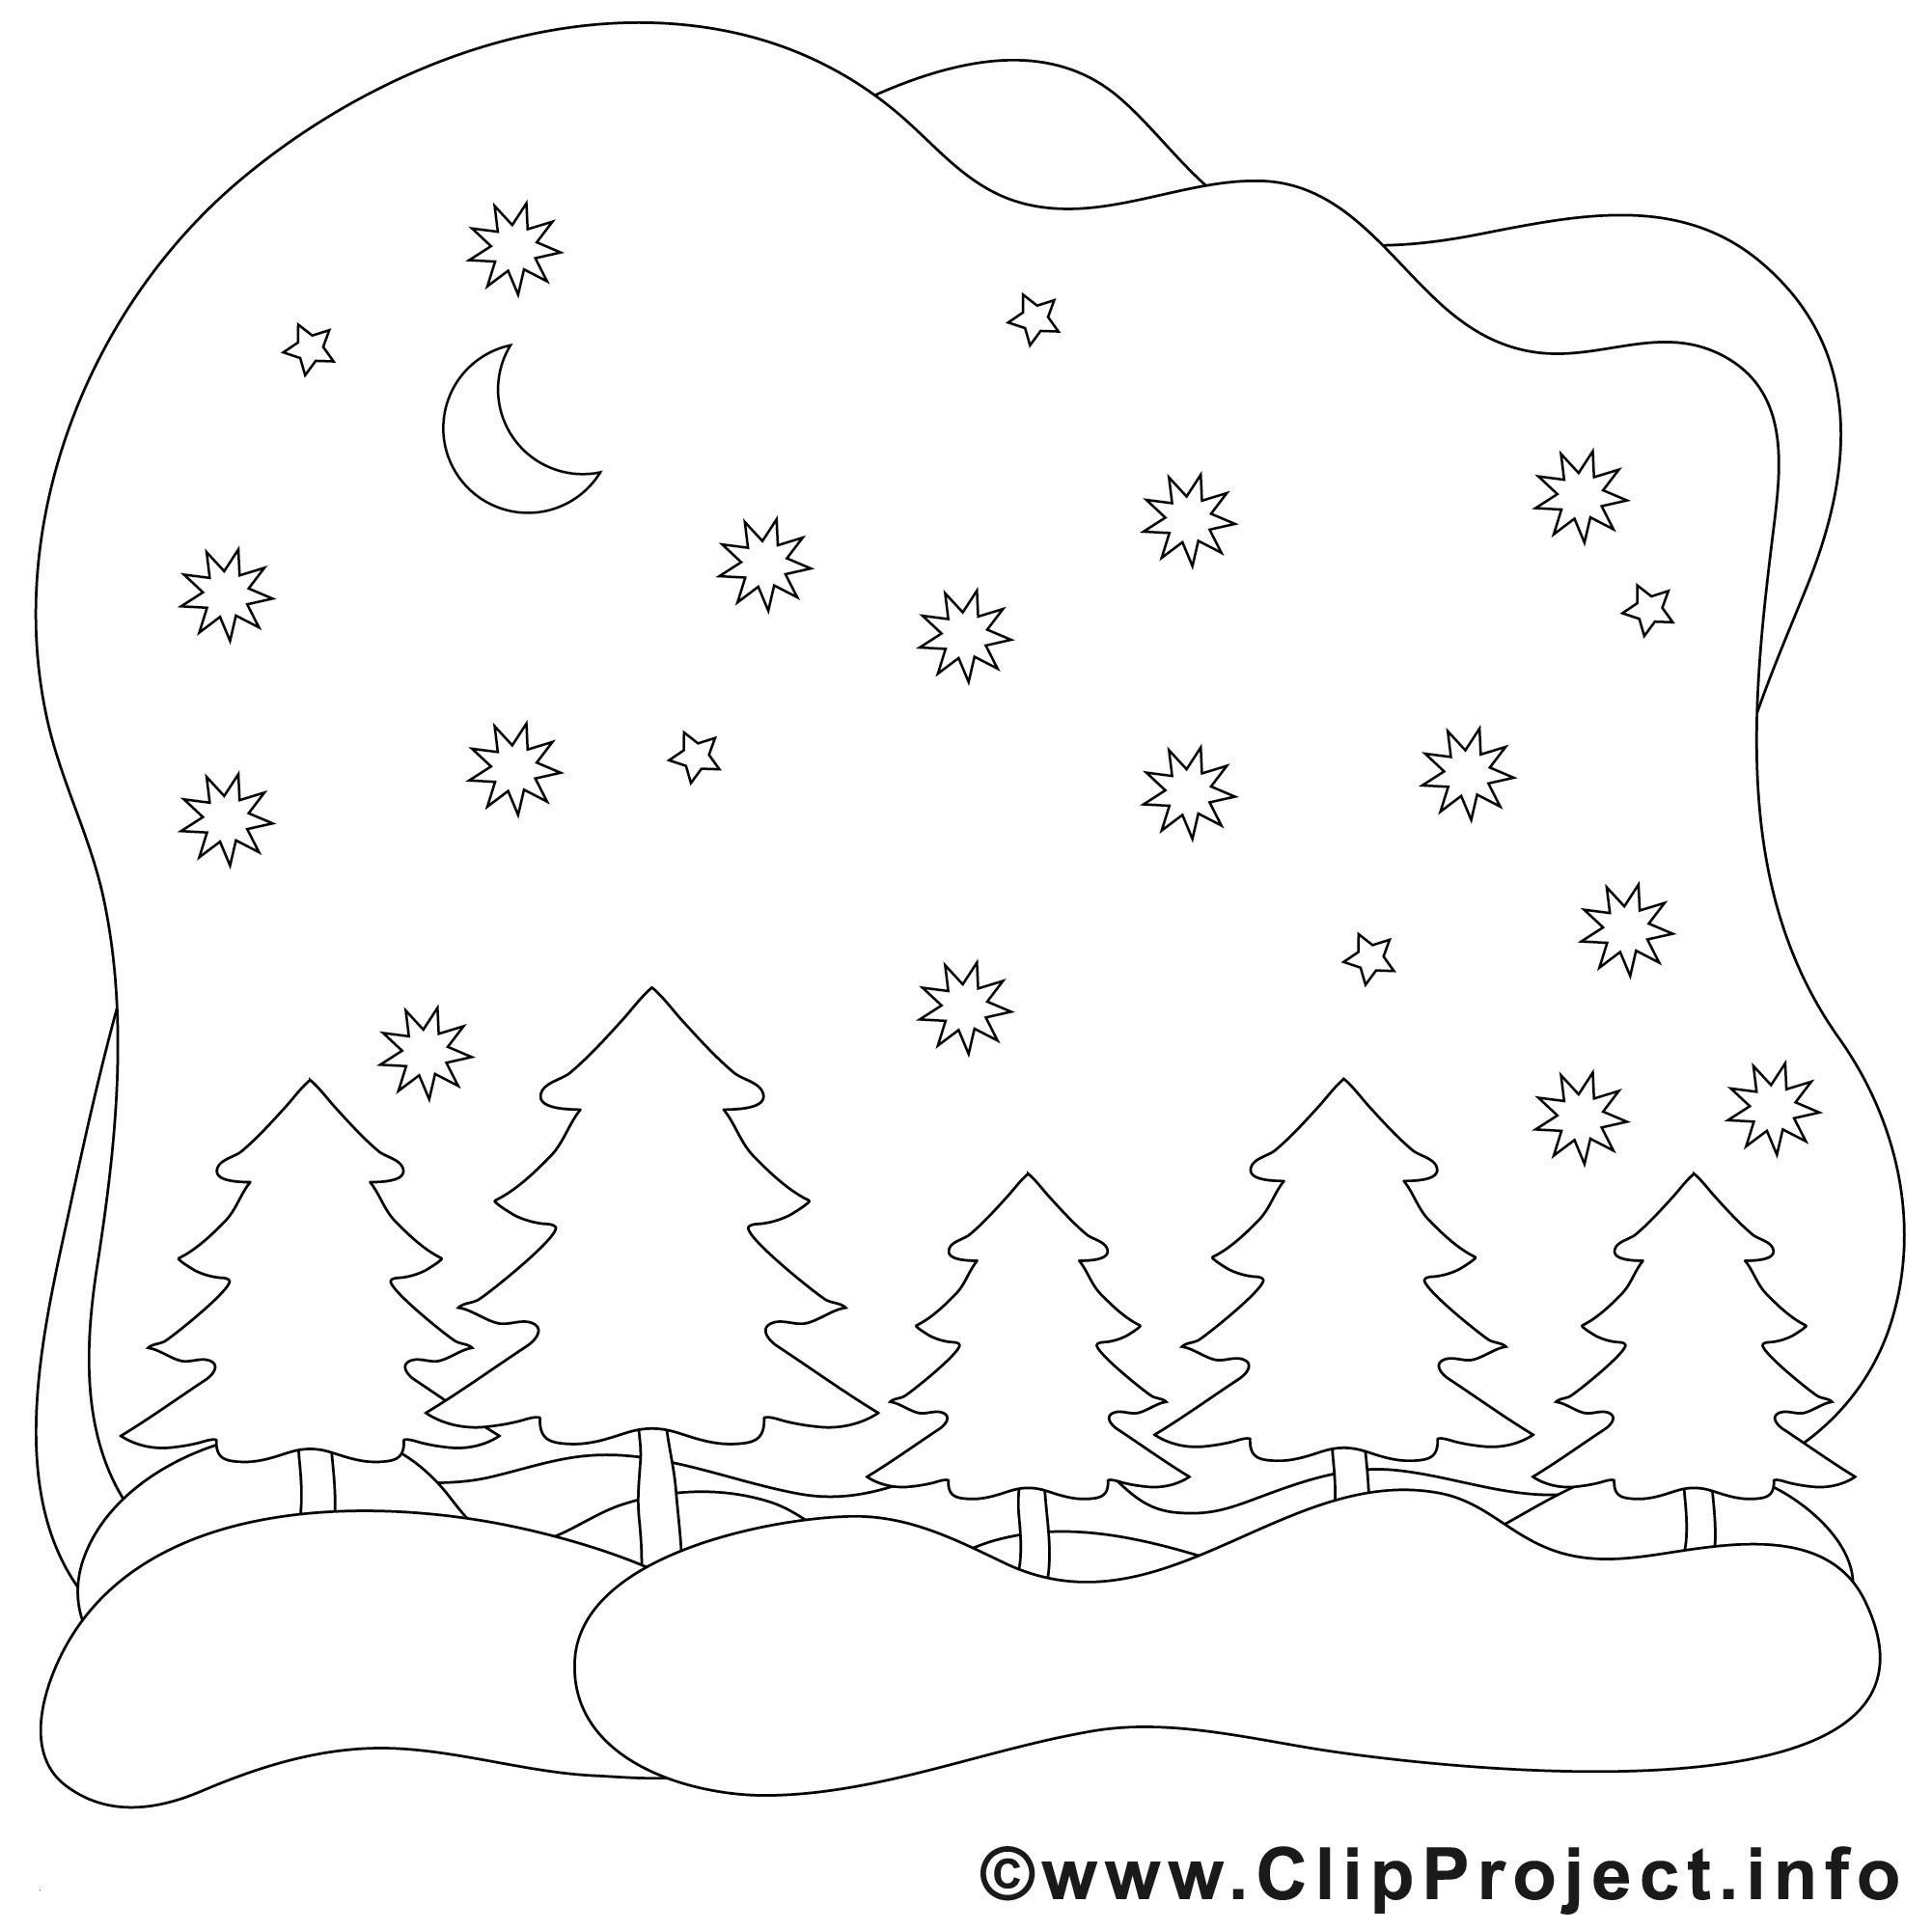 Ausmalbilder thema Wald Inspirierend 38 Ausmalbilder Winter Gratis Scoredatscore Frisch Ausmalbilder Wald Fotografieren